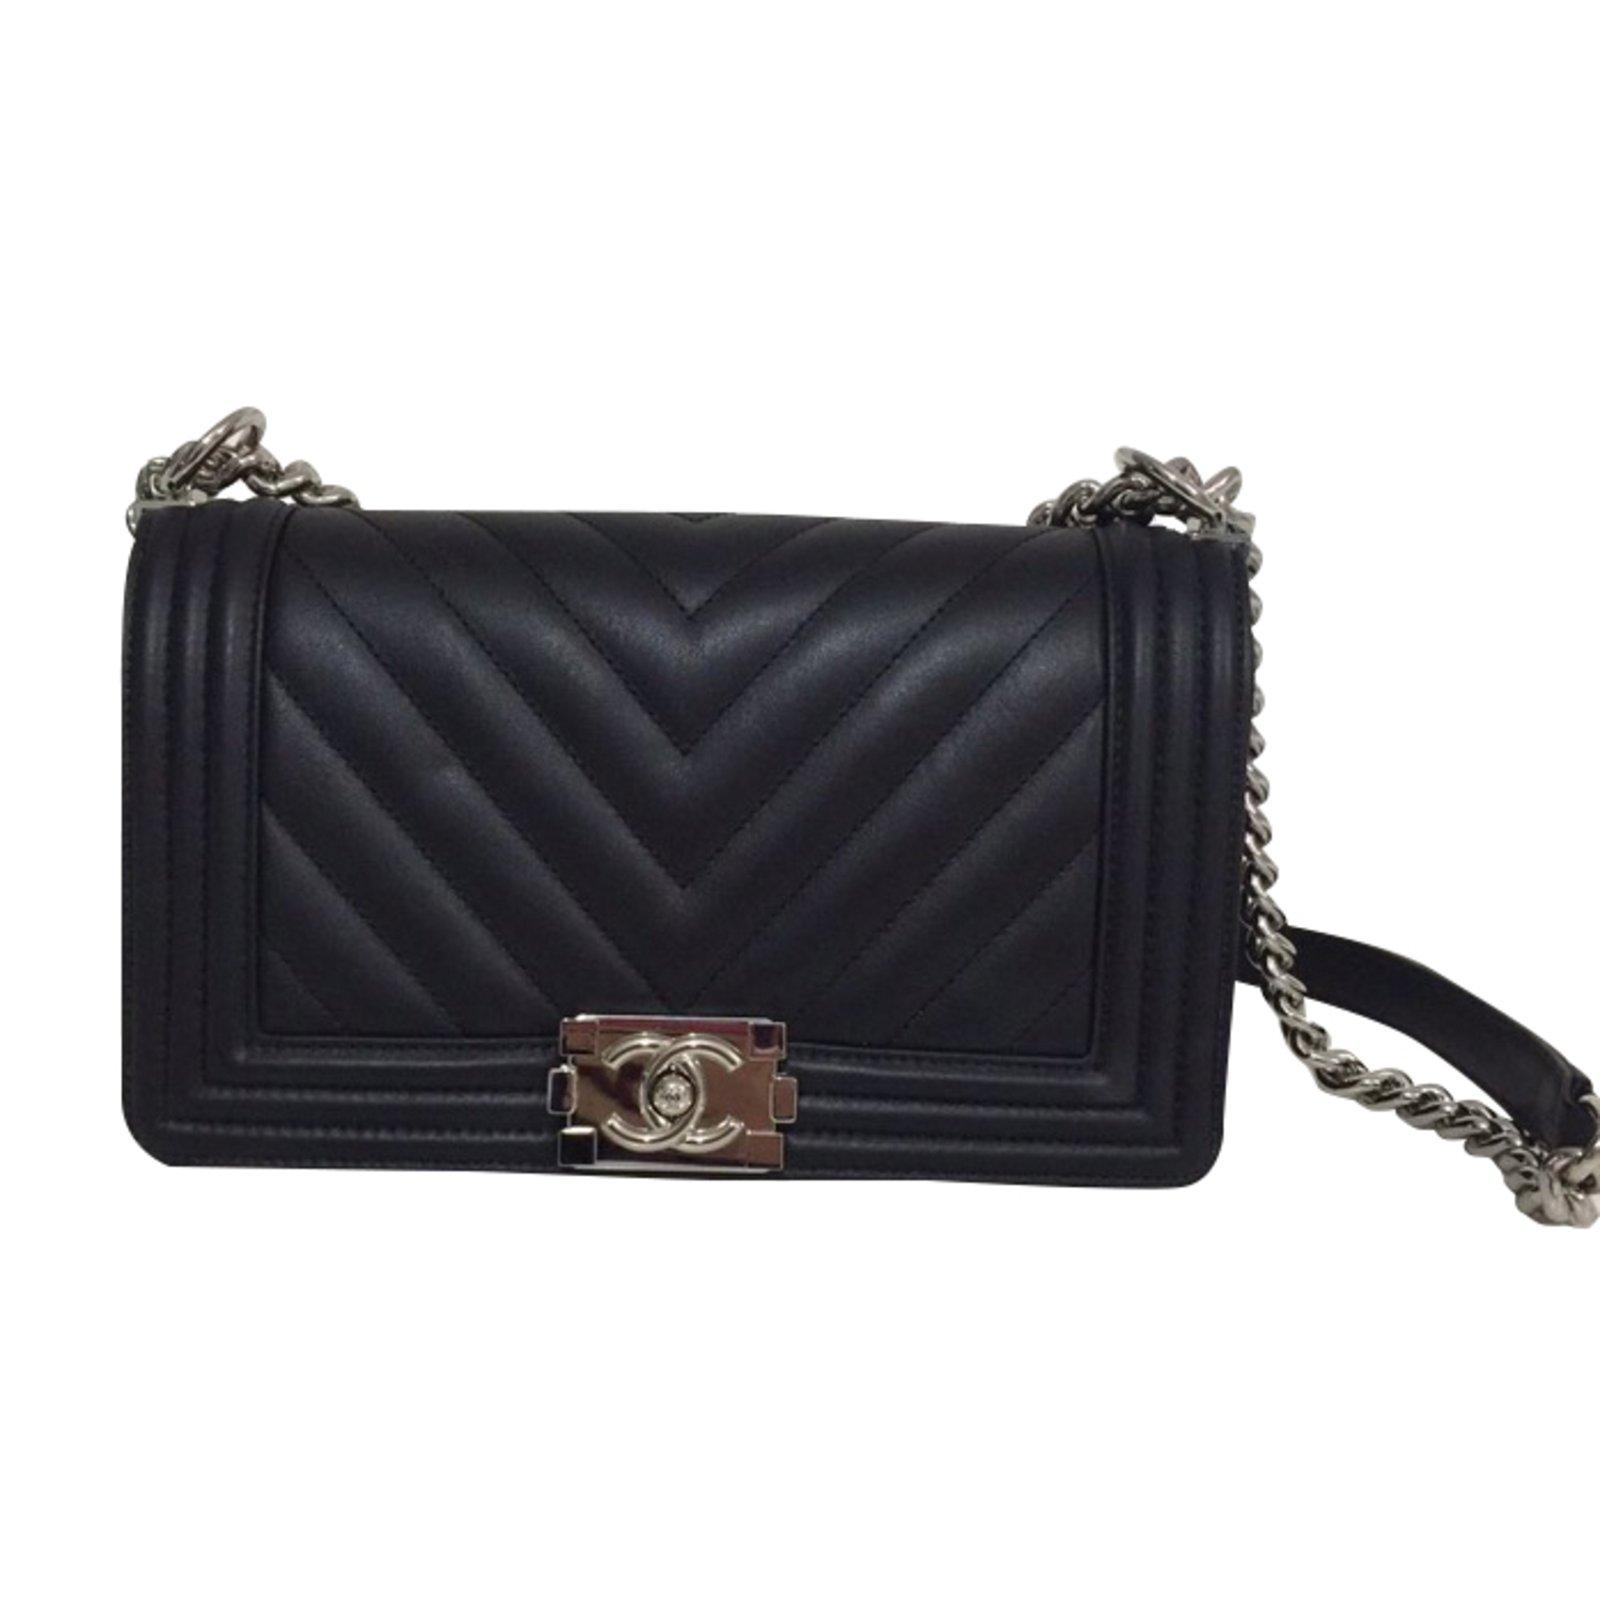 a75d7f7f91a83 Chanel boy chevron Handbags Leather Black ref.27971 - Joli Closet